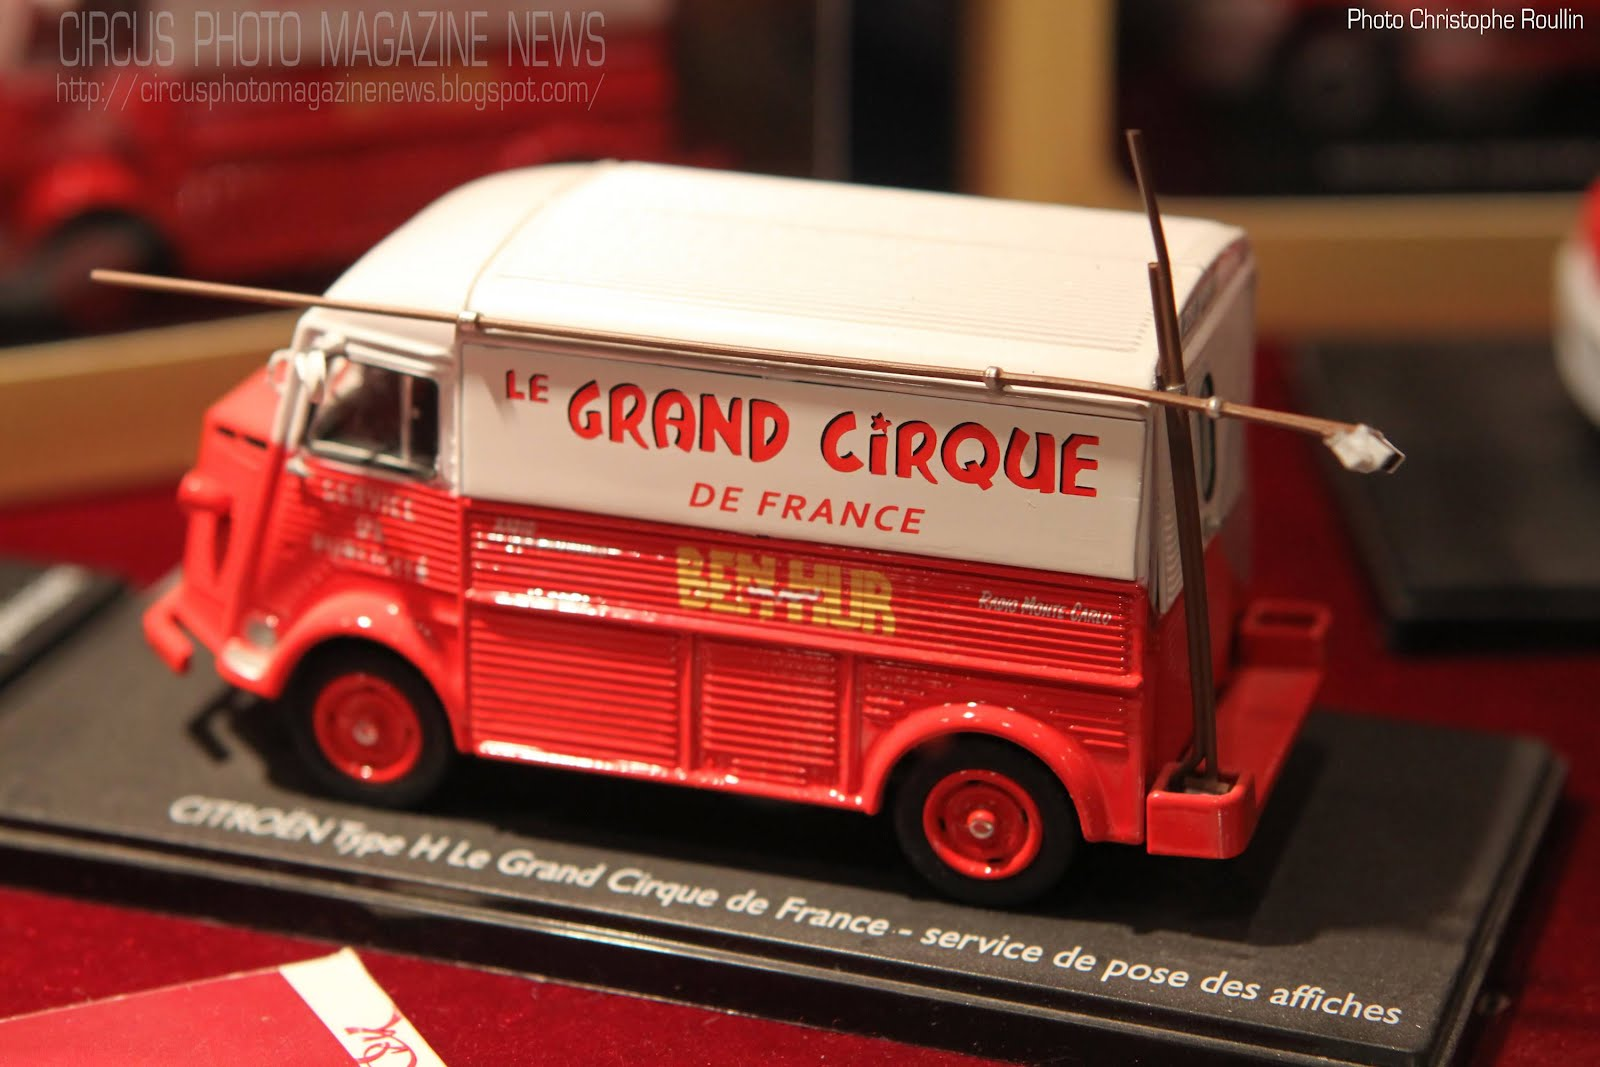 circorama part ii collection dans la boutique du cirque arlette gruss. Black Bedroom Furniture Sets. Home Design Ideas